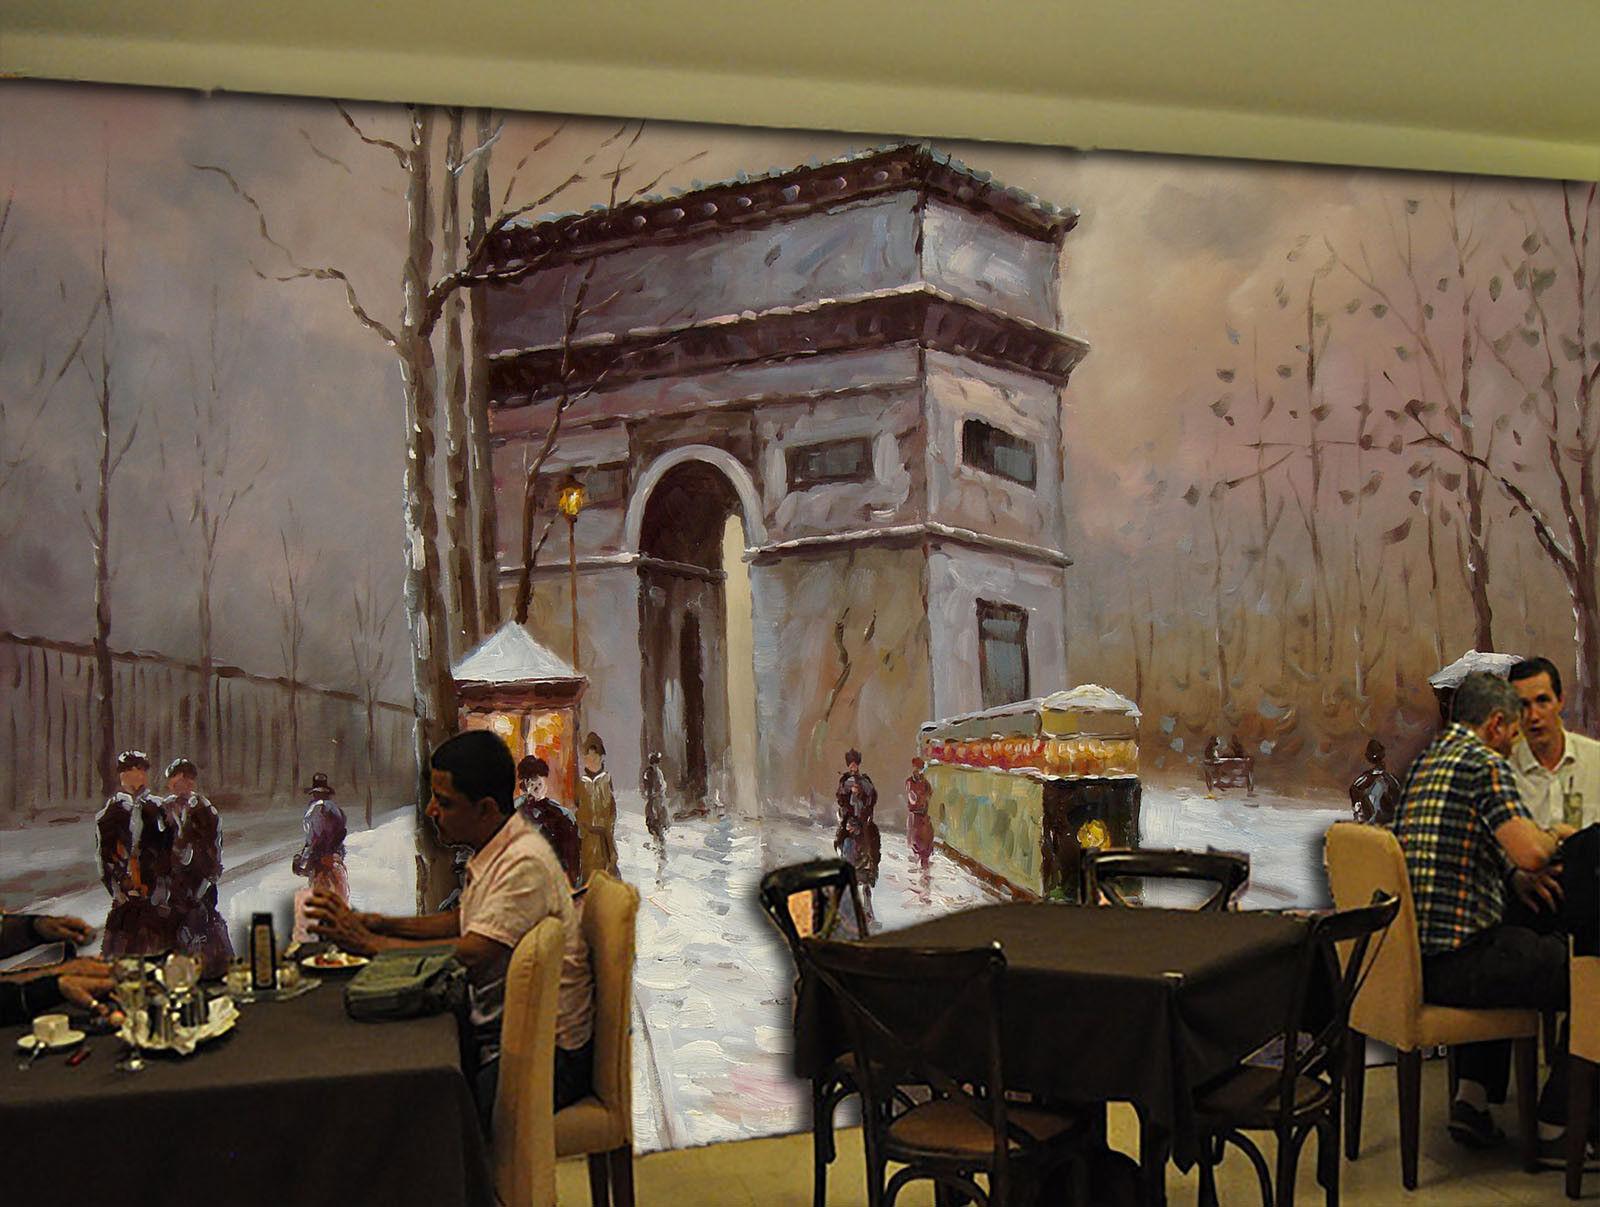 Papel Pintado Mural Mural Mural De Vellón Puerta De La Torre Vieja 2 Paisaje Fondo Pantalla 968bdf